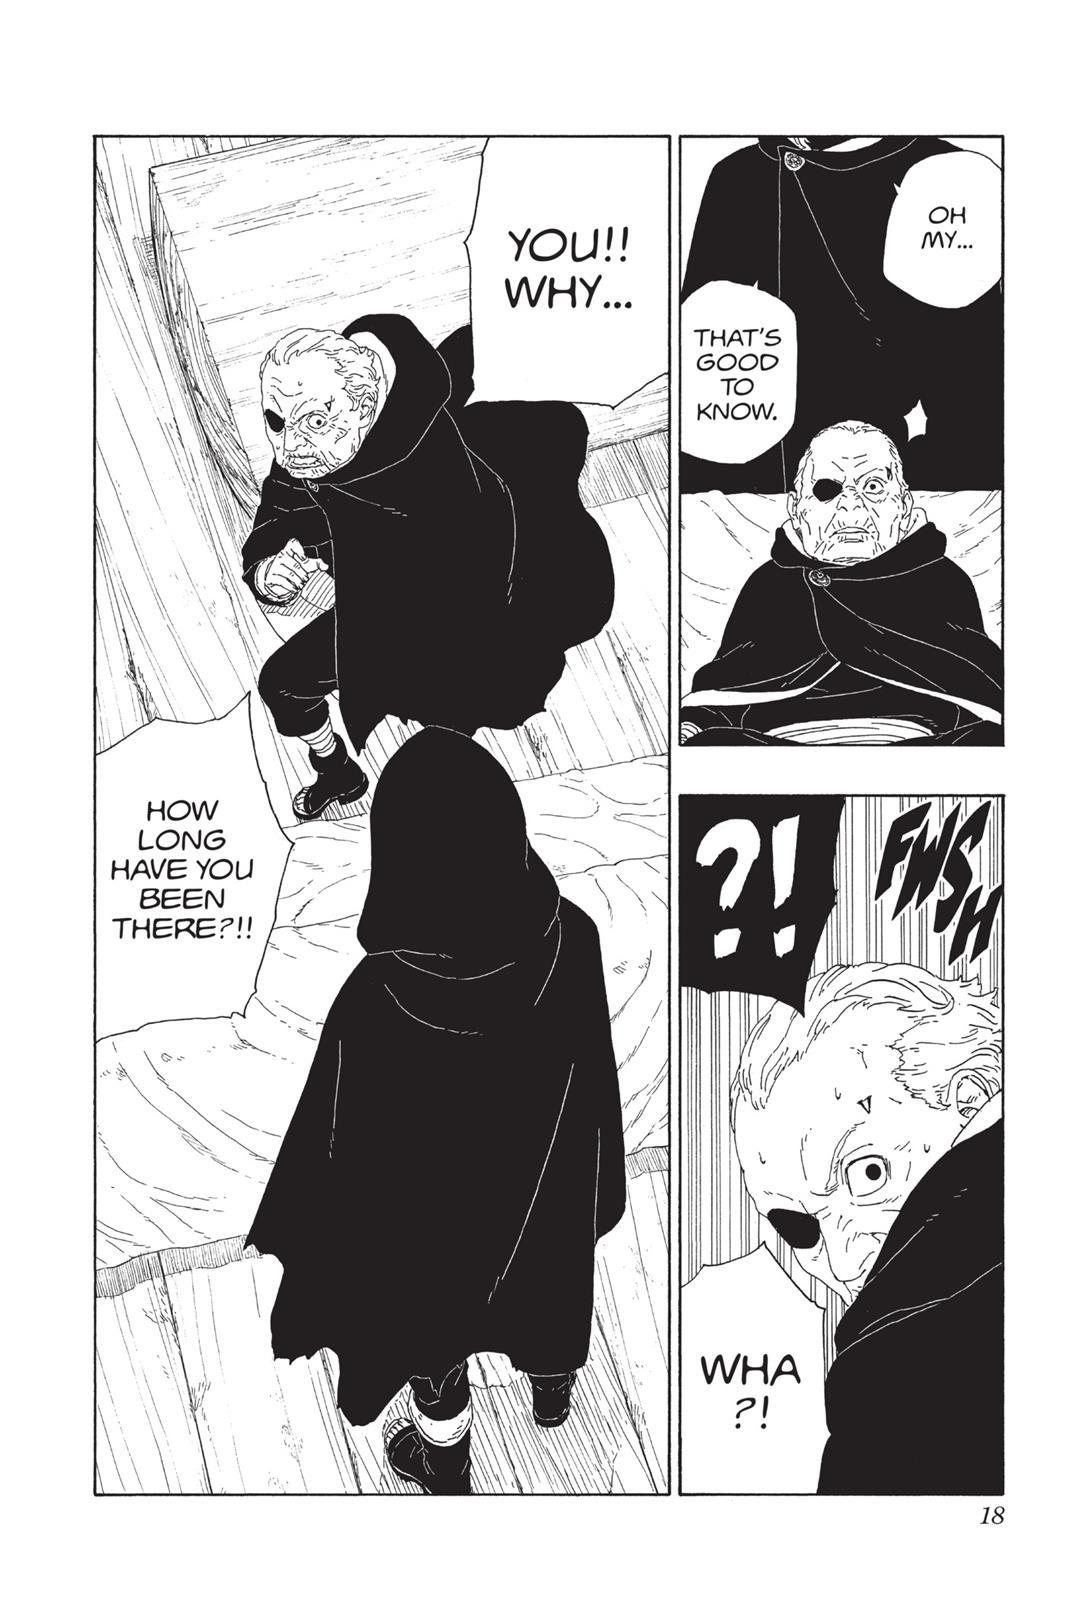 Boruto, Chapter 16 Boruto Manga Online en 2020 Proyectos